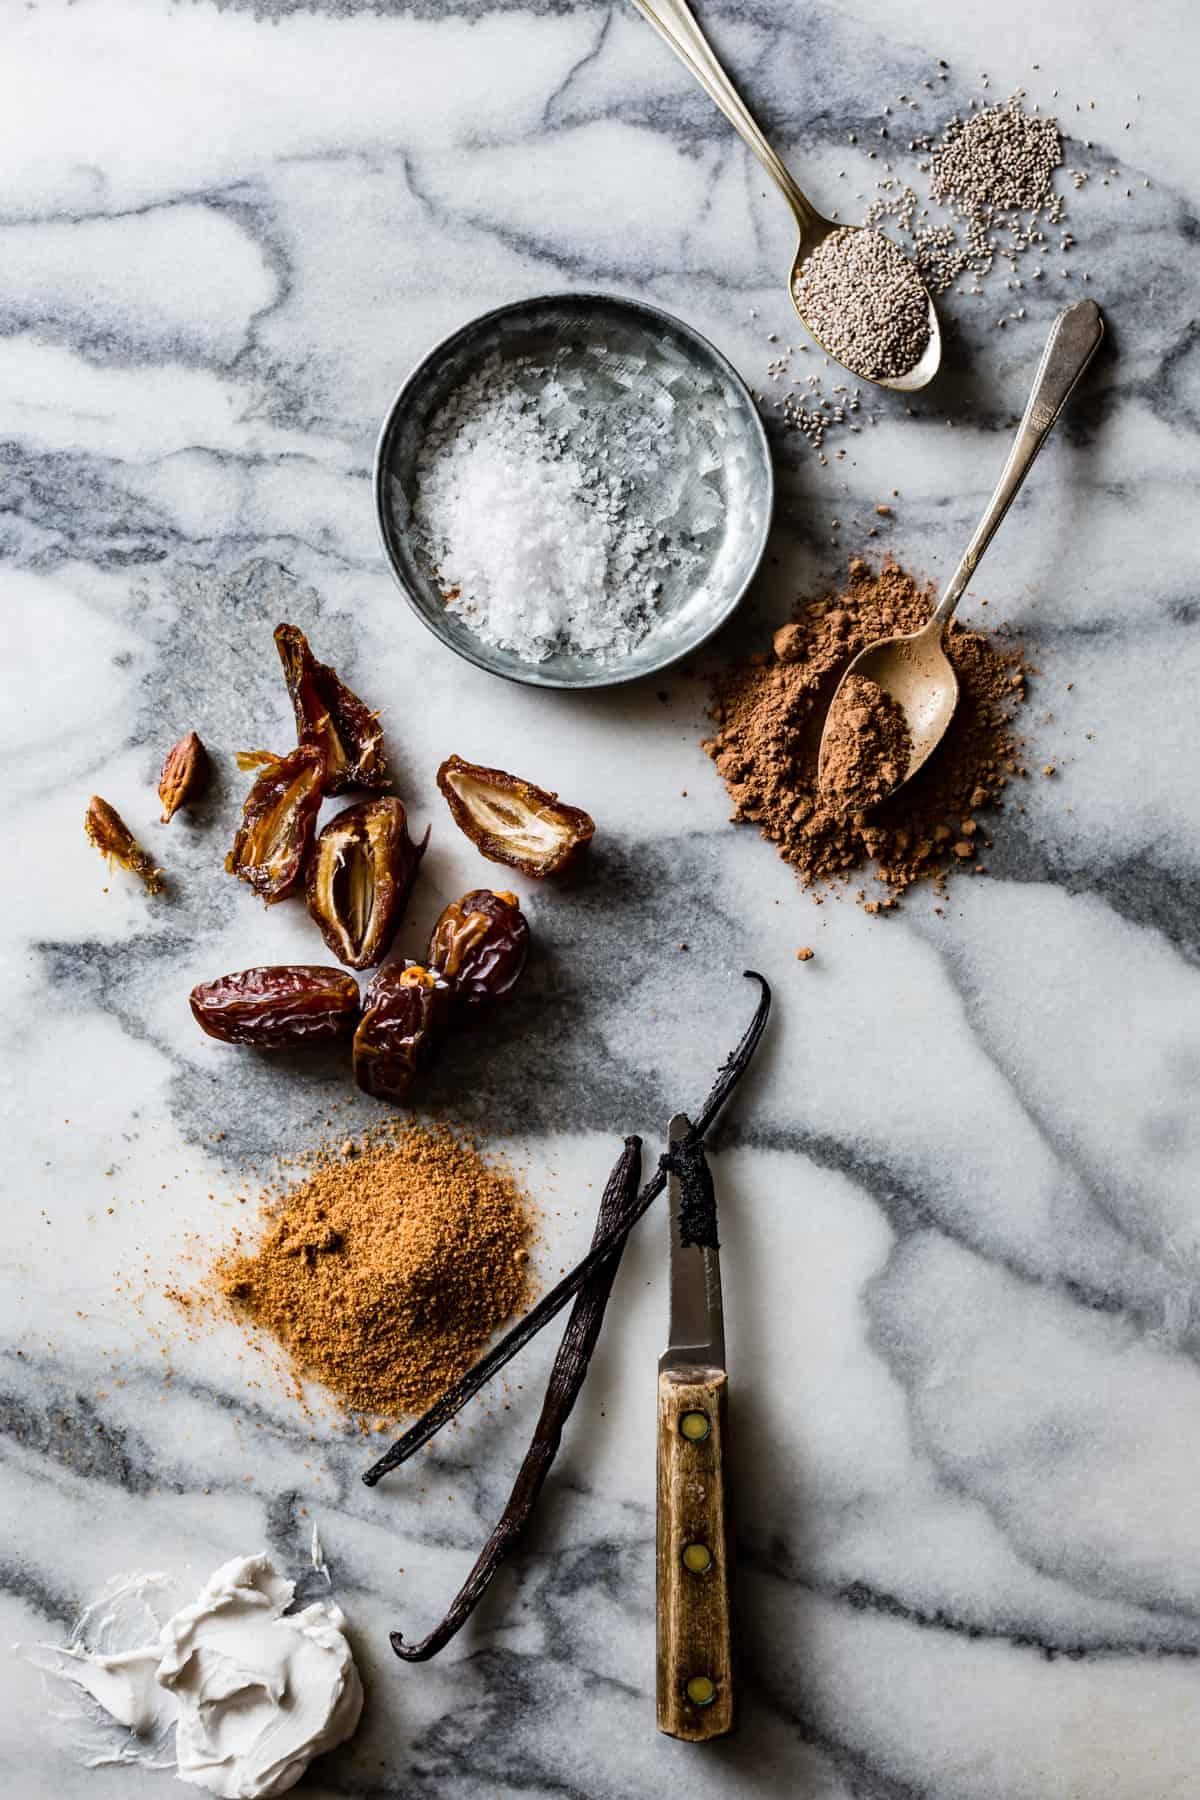 Vegan Salted Caramel & Chocolate Swirl Popsicles